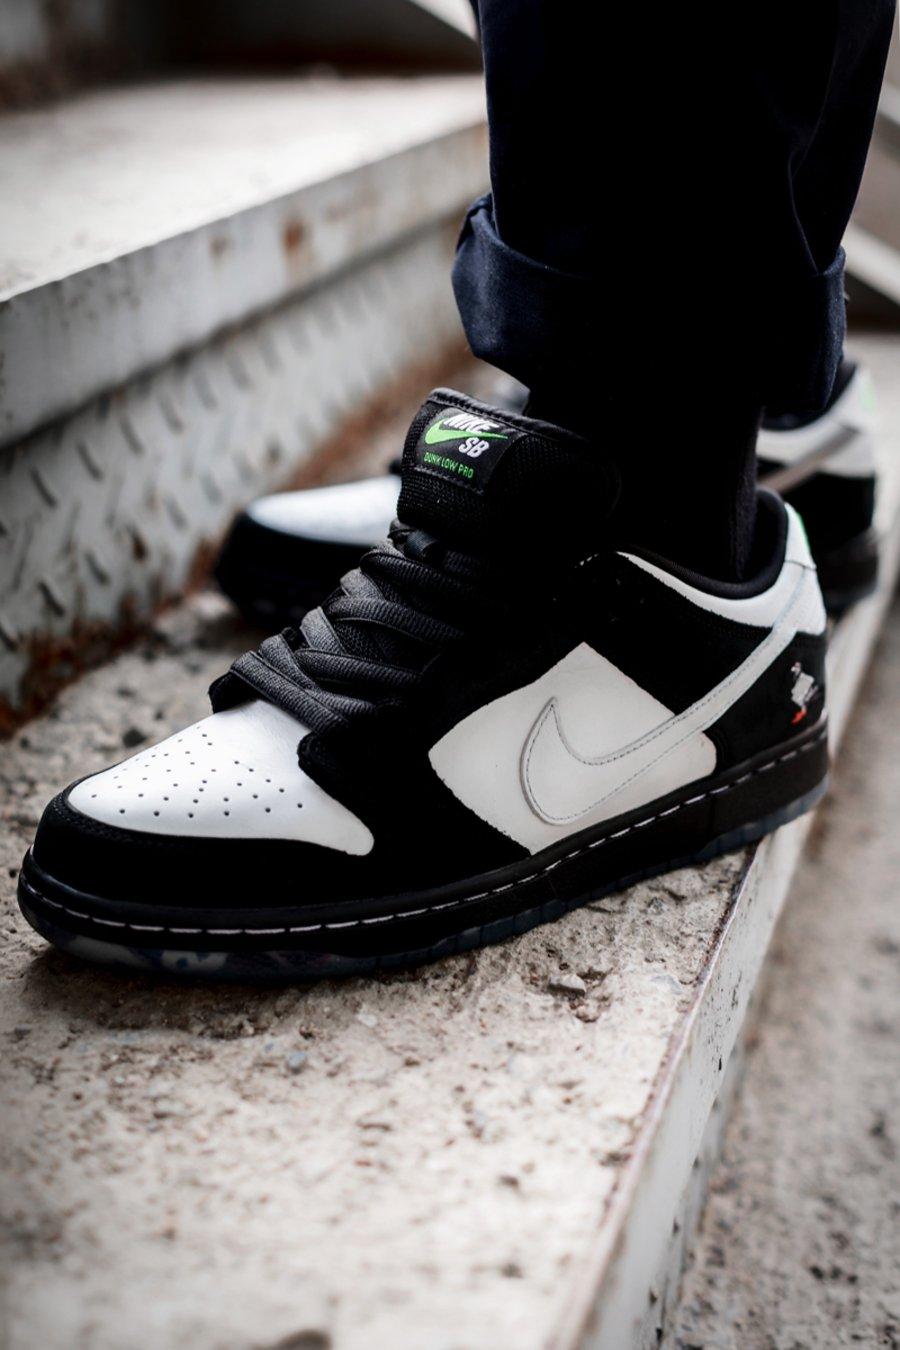 Air Force 1,Nike  2019「每月最貴鞋王」大盤點!最貴一雙比黑絲綢貴 3 倍!